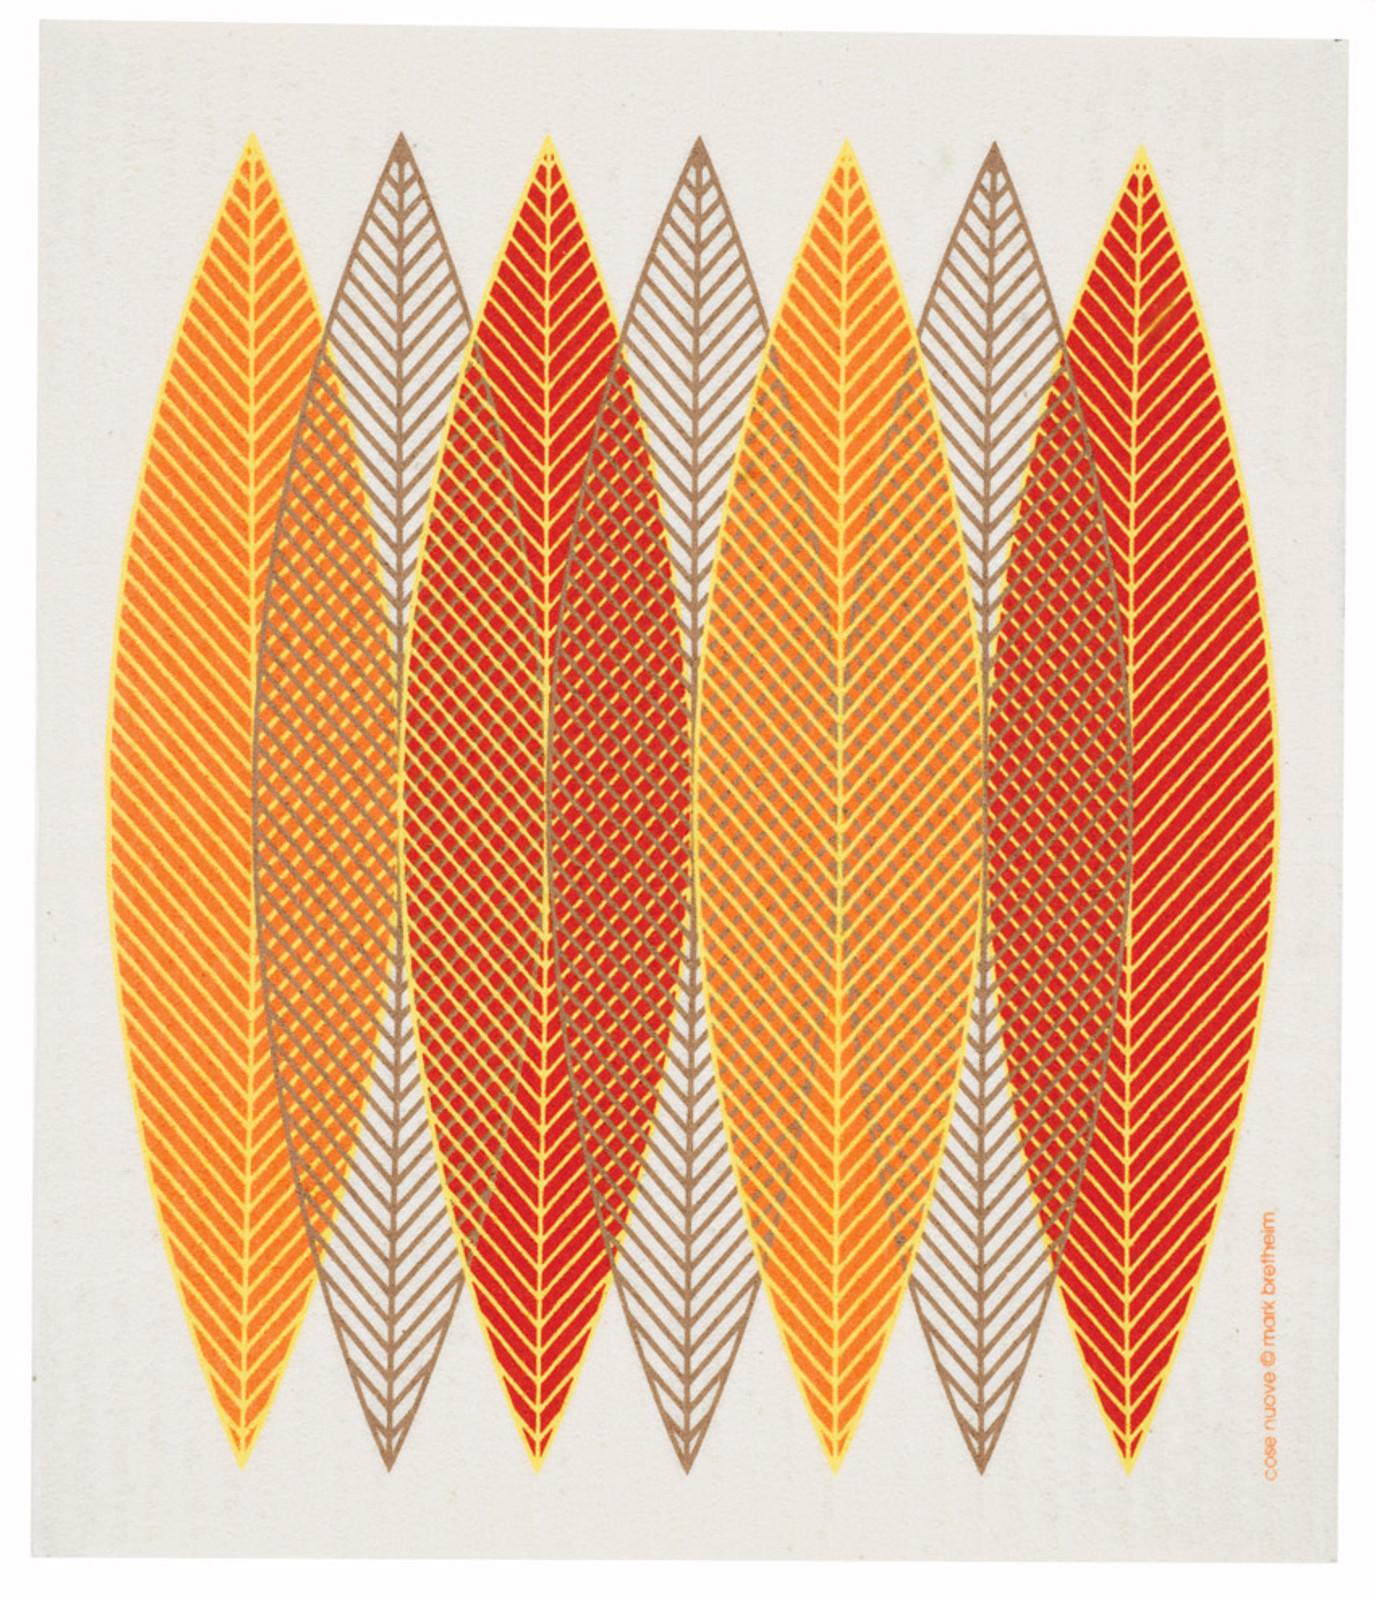 Swedish dish cloth, Orange Blade Leaves design